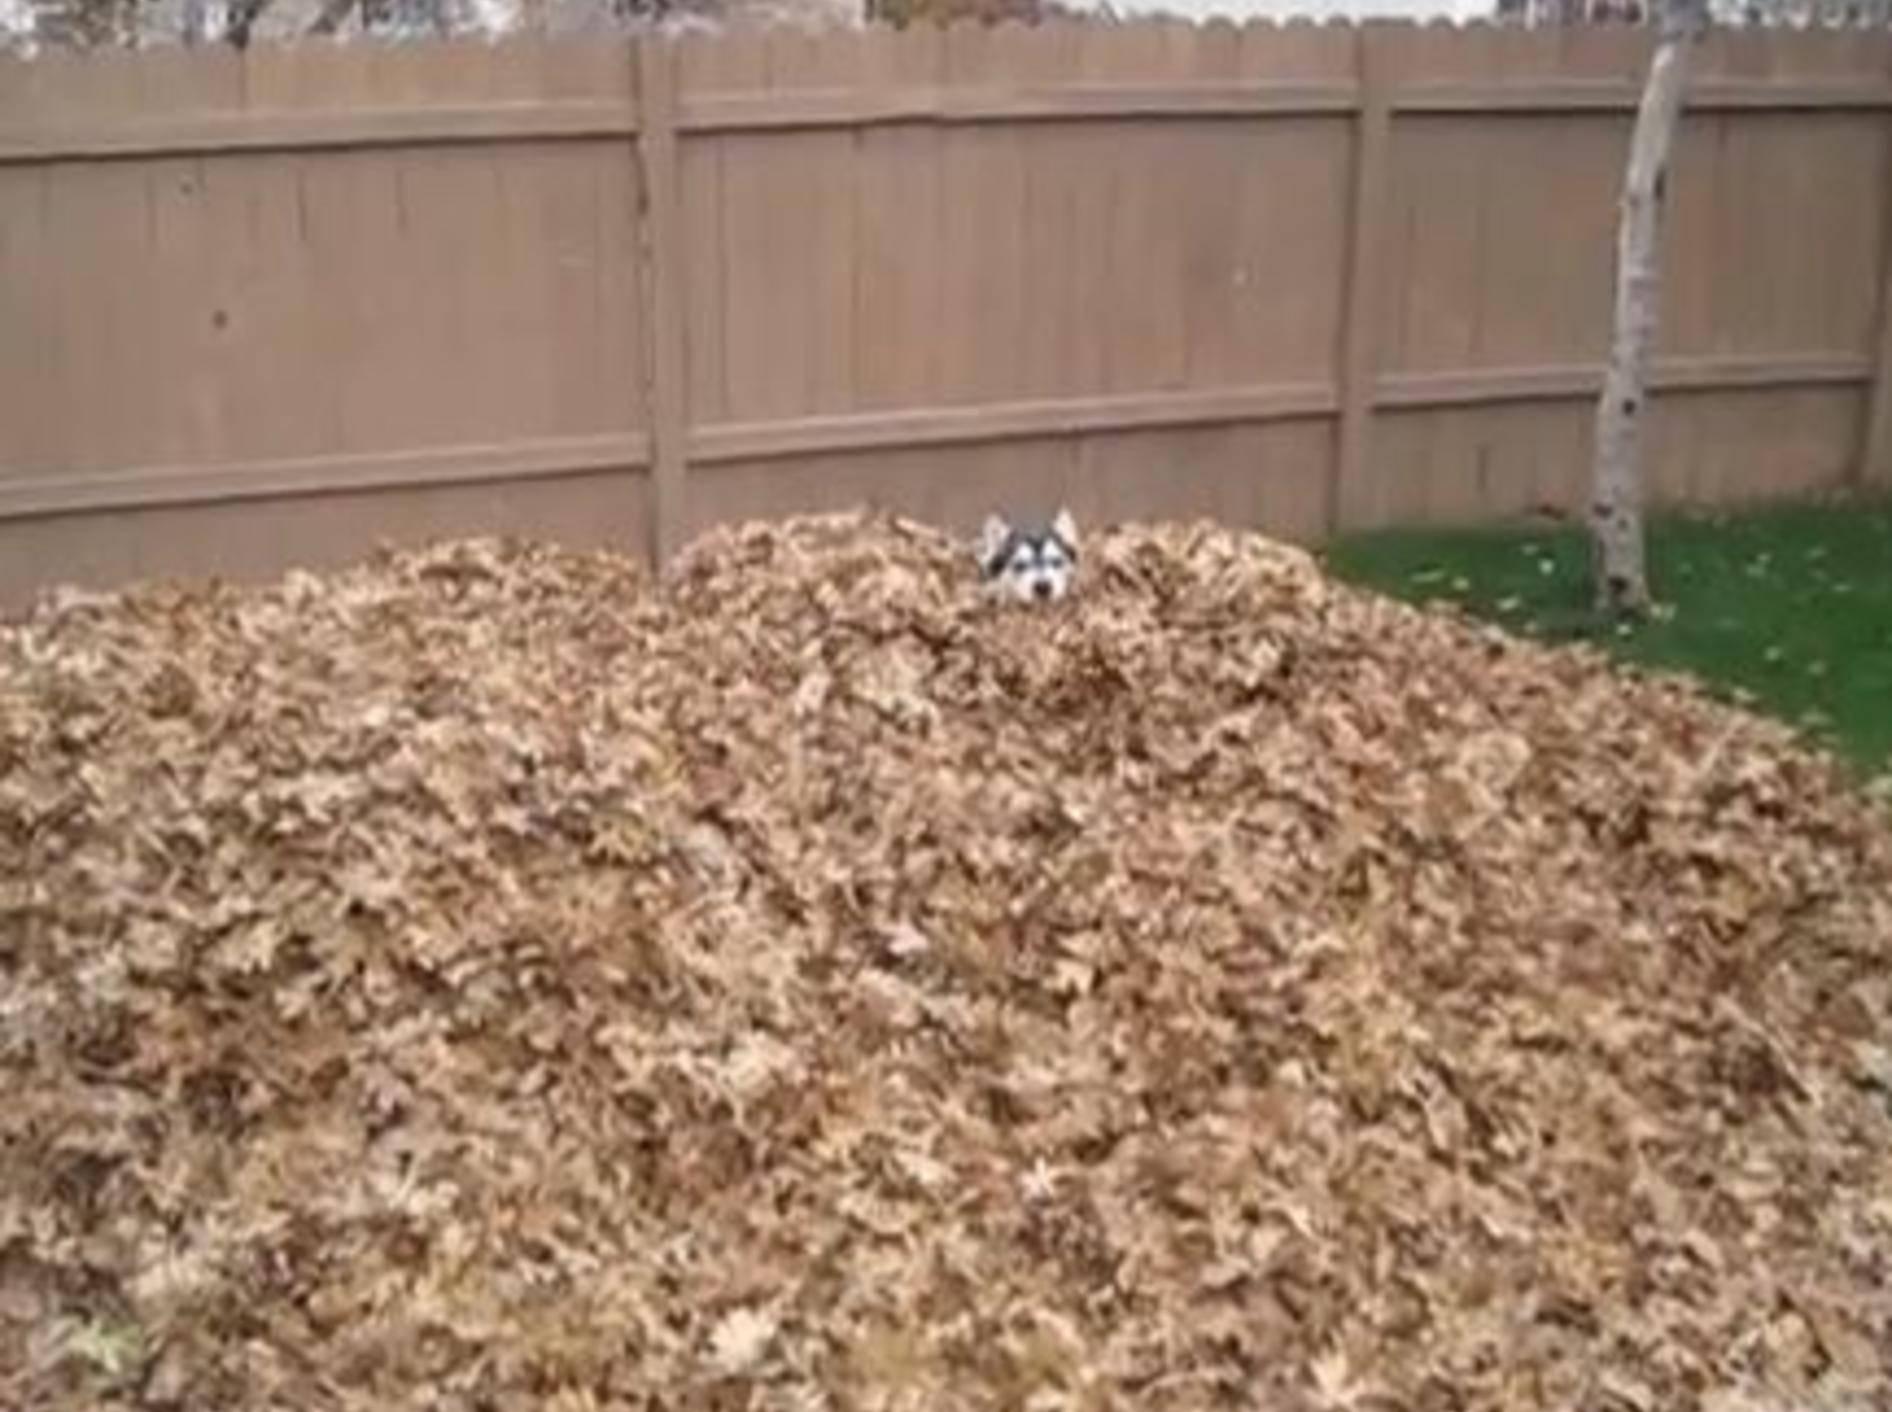 Ein Husky präsentiert: Herbst-Spaß im Blätterhaufen — Bild: Youtube / Kent Petersen·